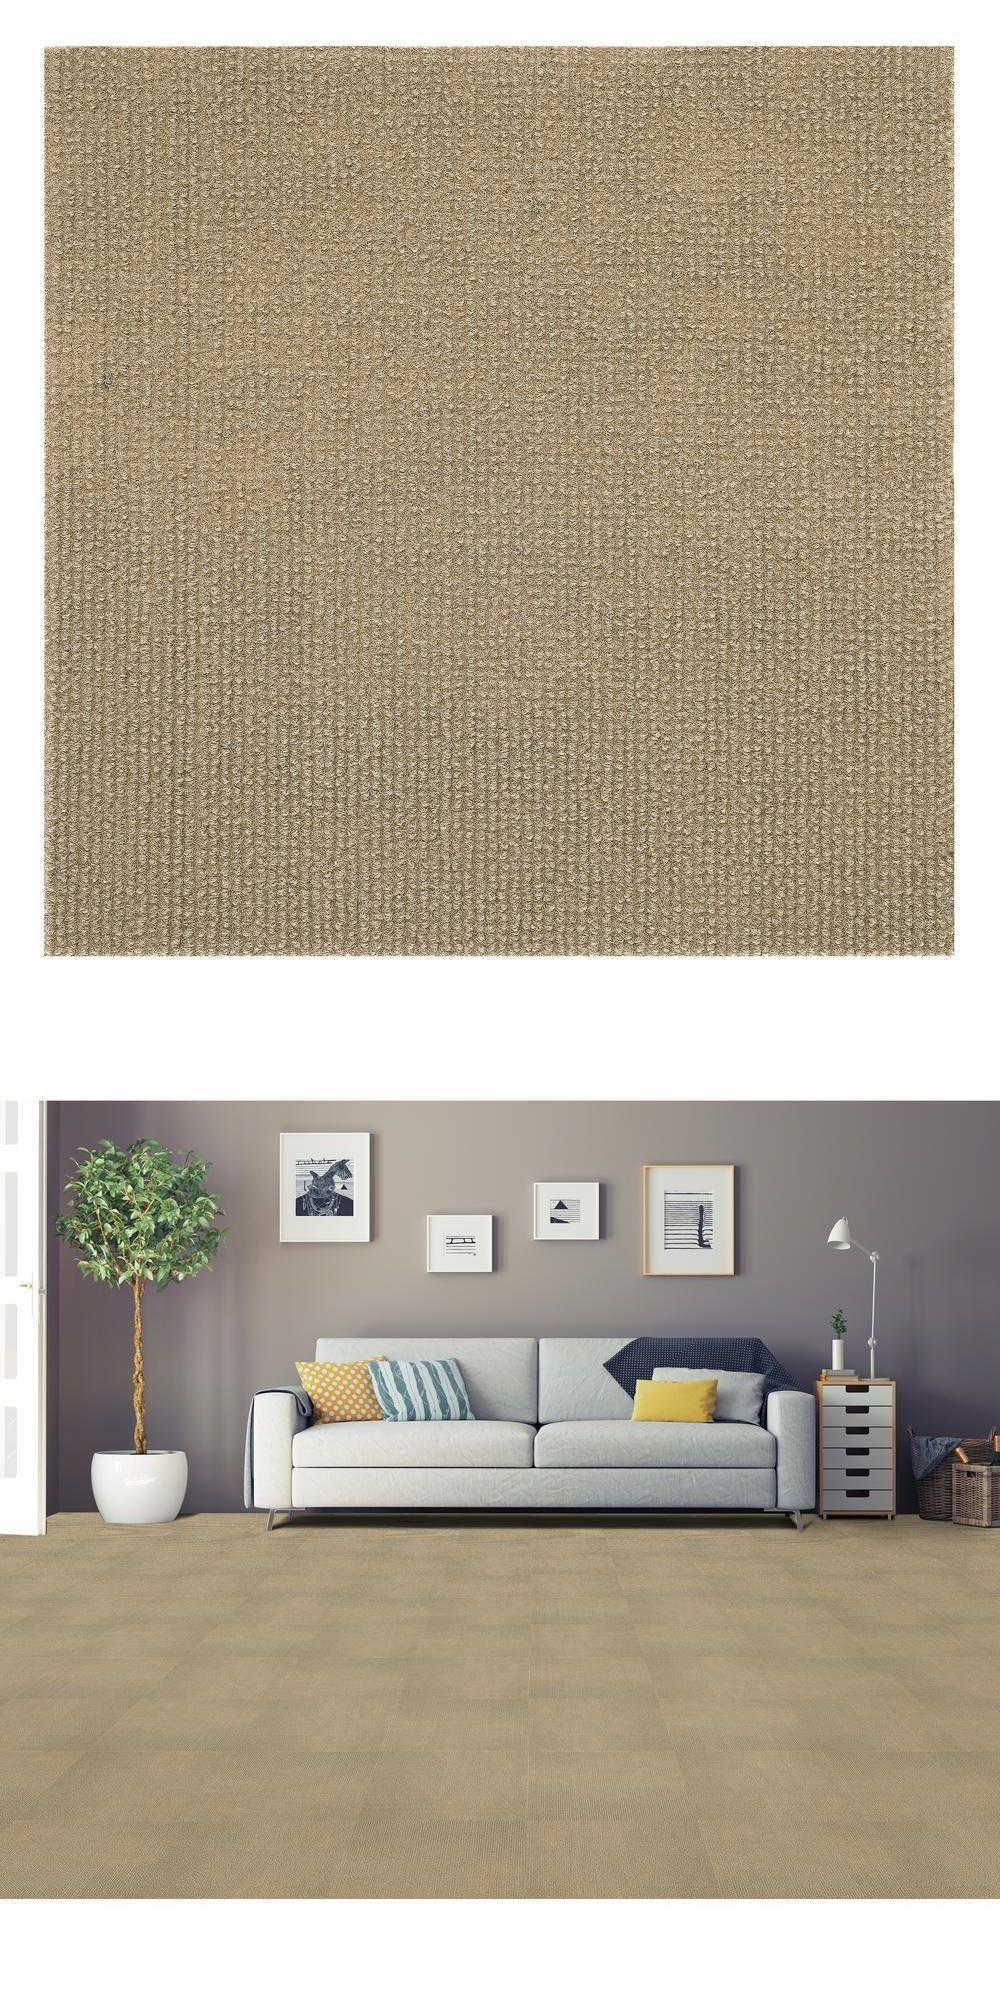 Carpet Tiles 136820 Nexus Tan 12 In X 12 In Peel And Stick